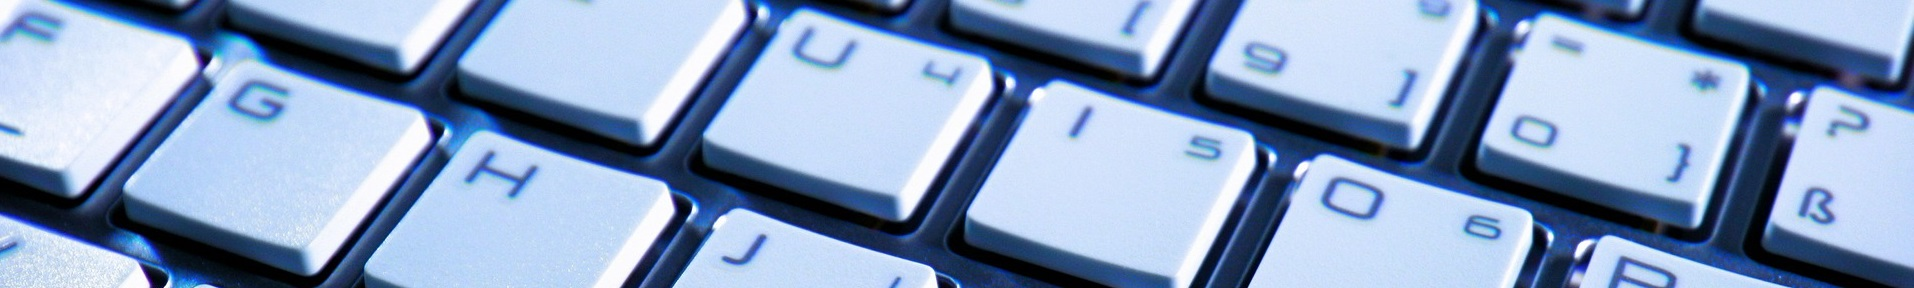 keyboard-70506_1920